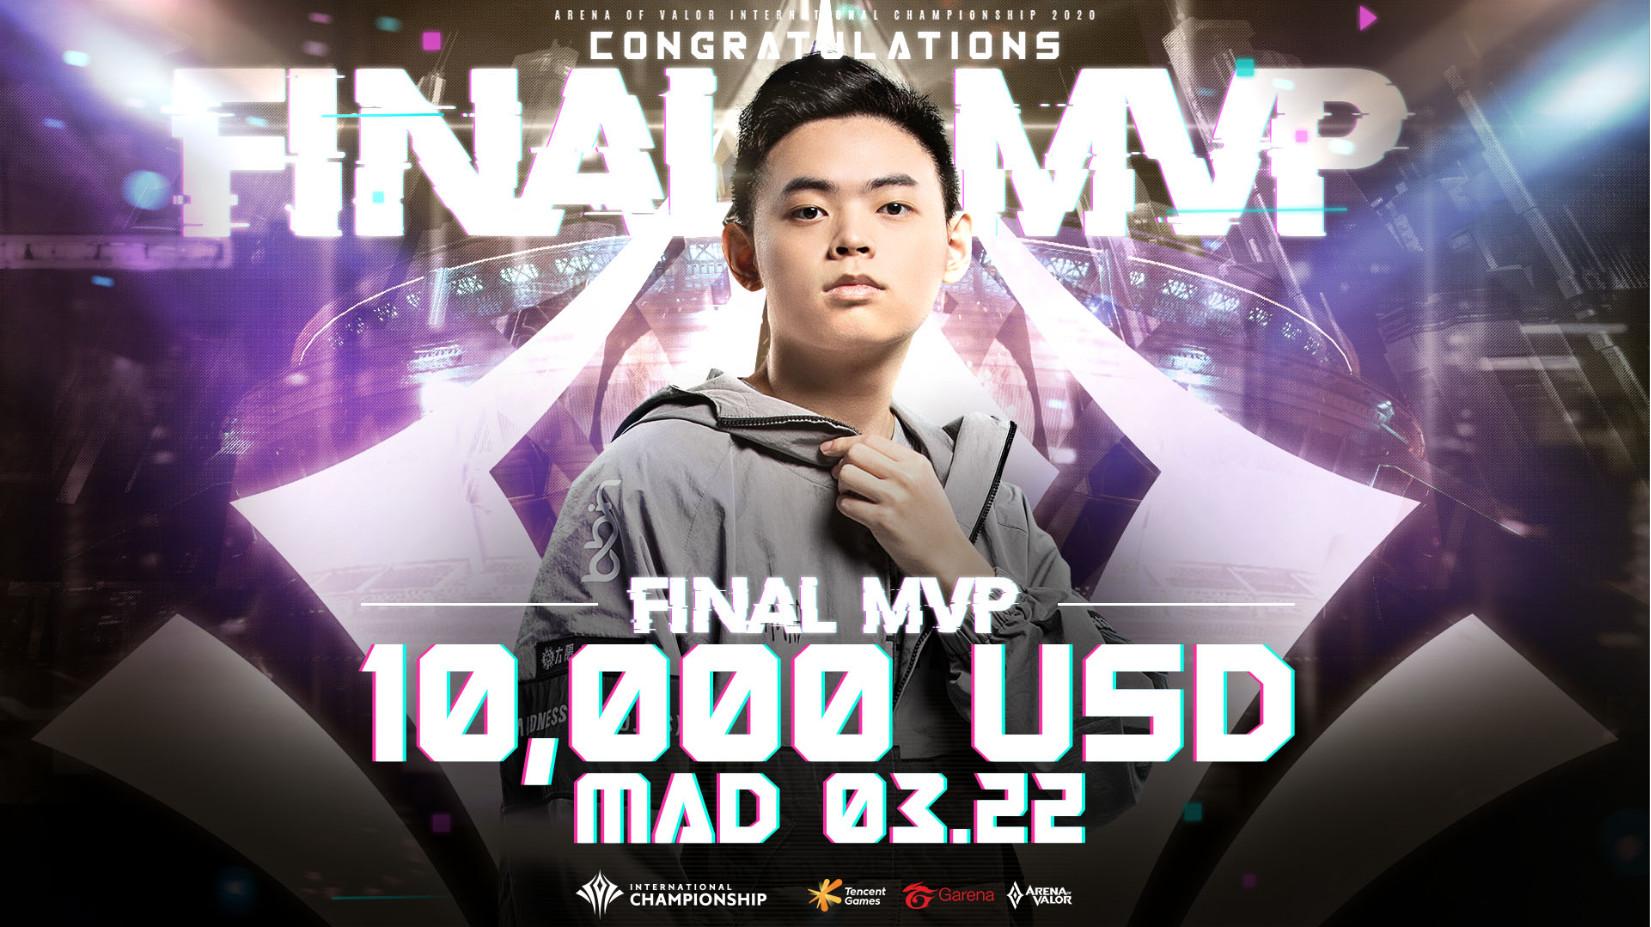 MAD 03.22被選為「AIC 2020國際賽 Final MVP」